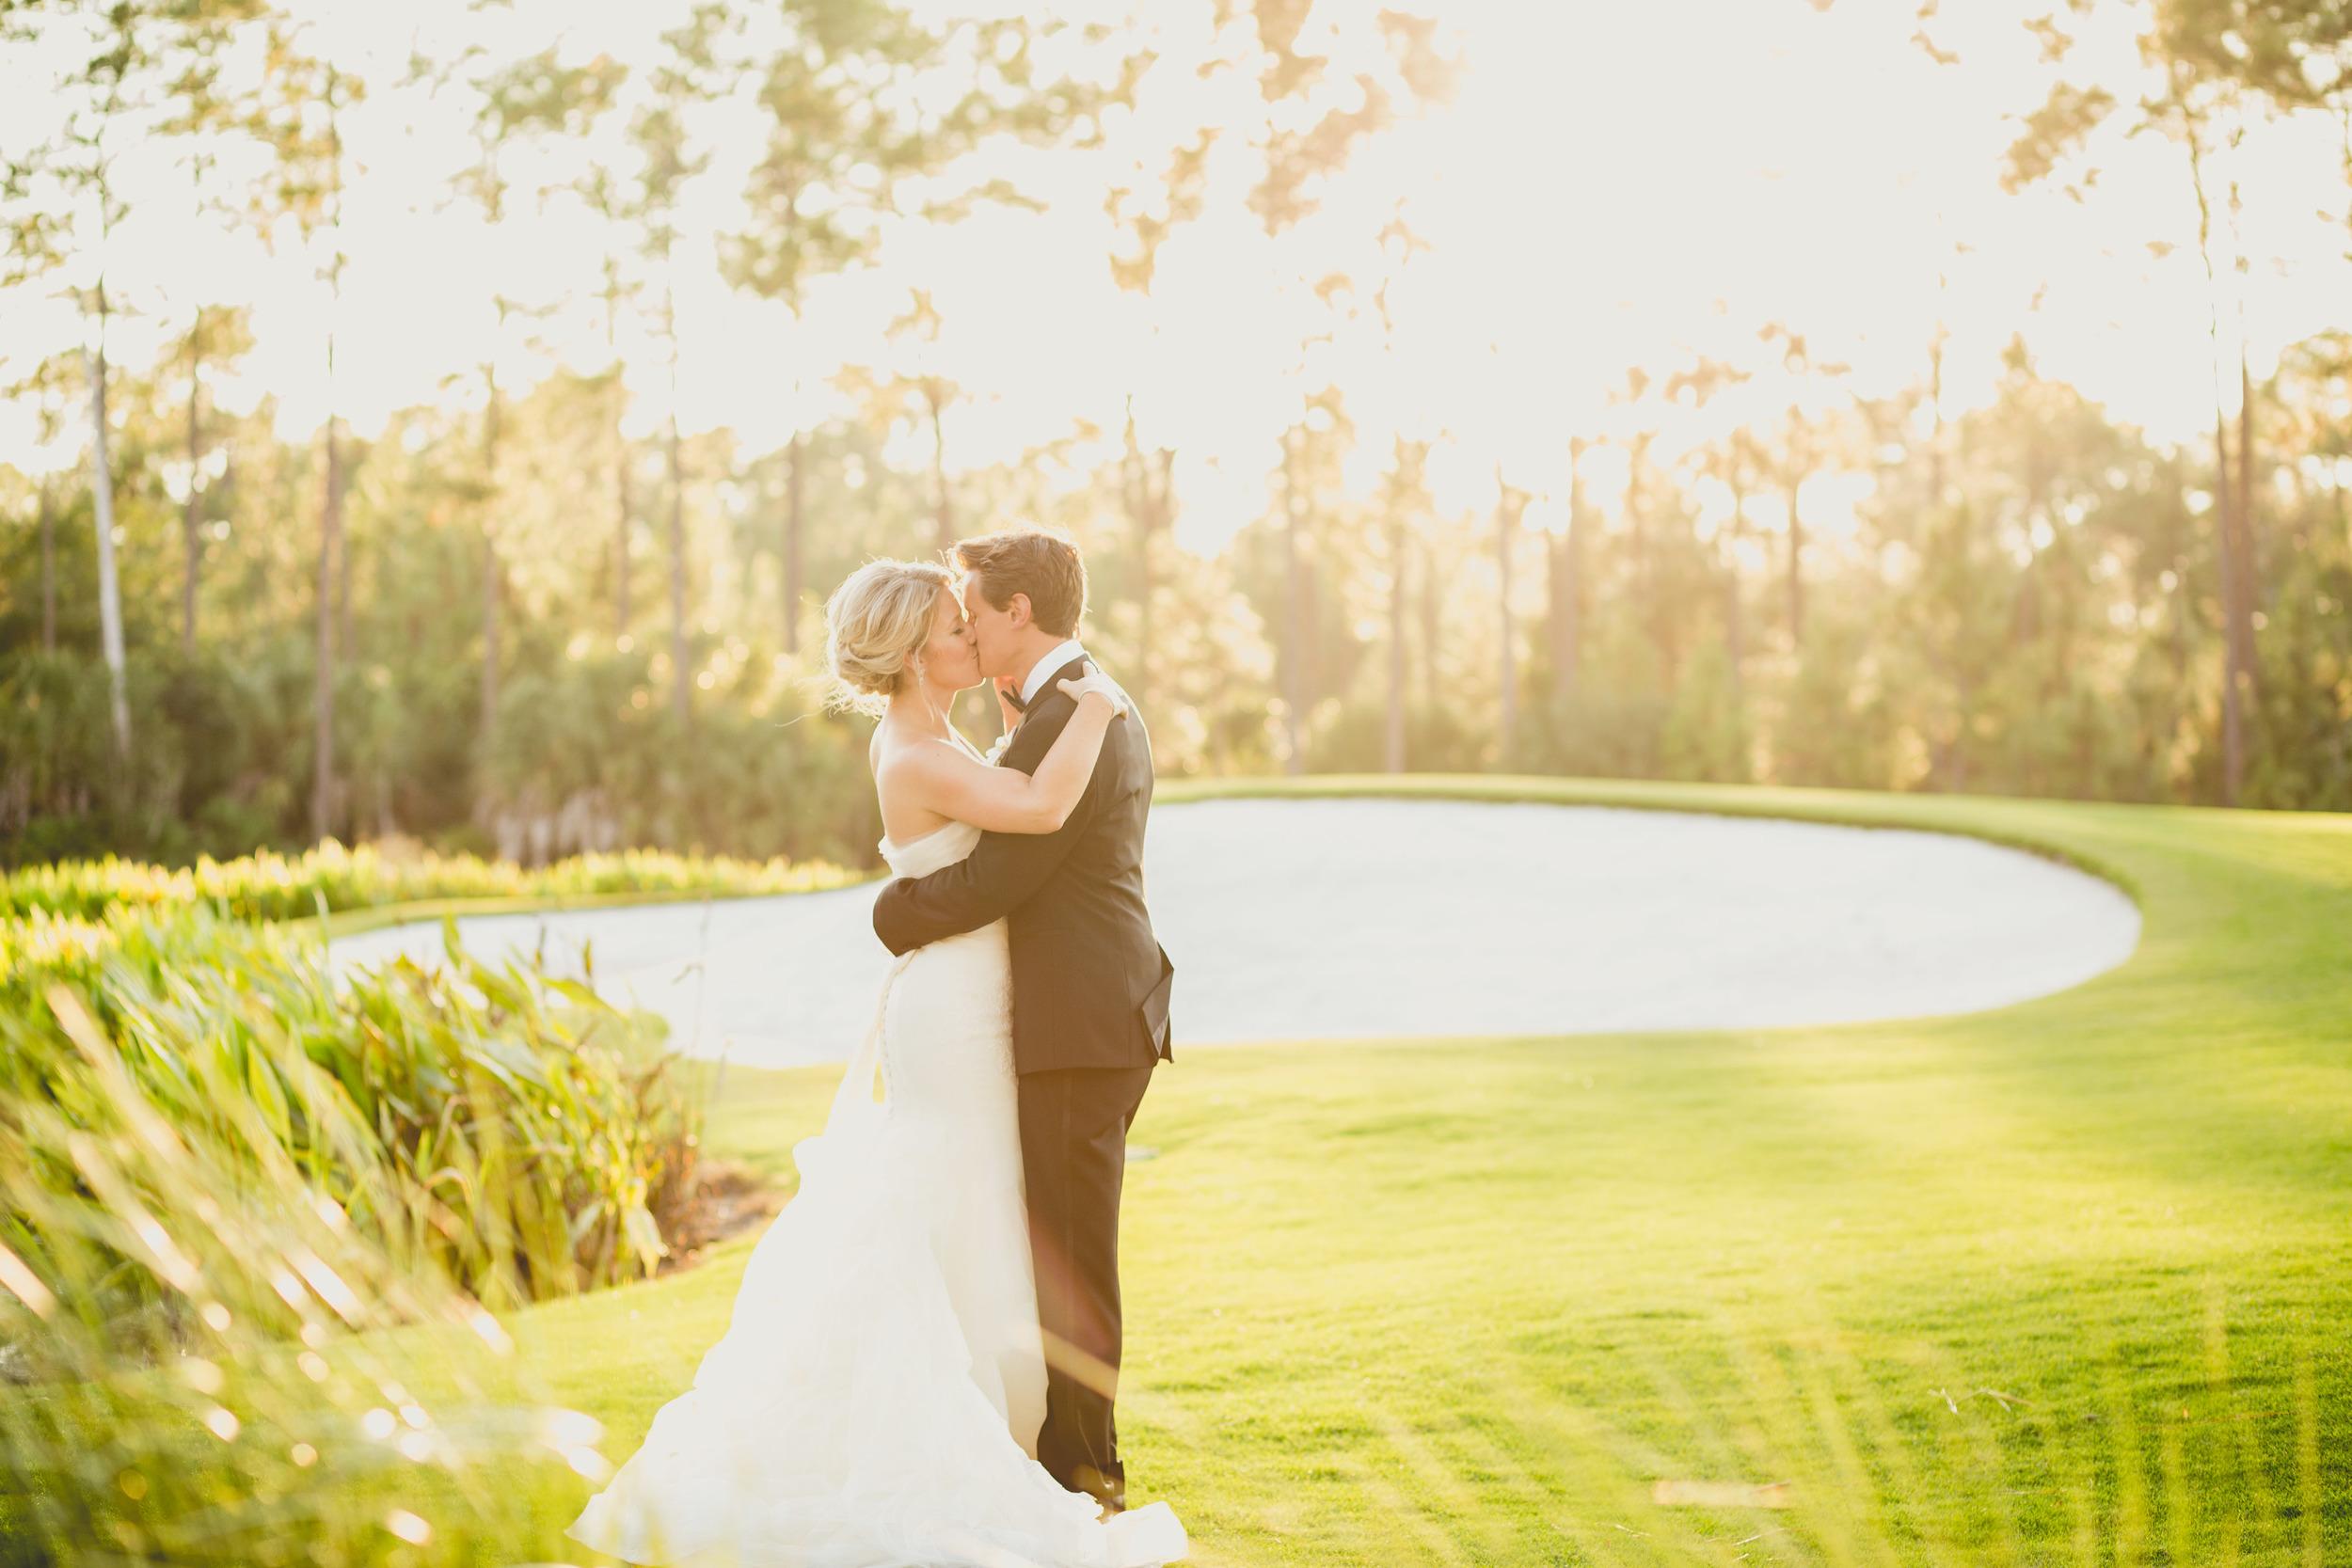 Naples florida, miami wedding photographer, perfect wedding timeline